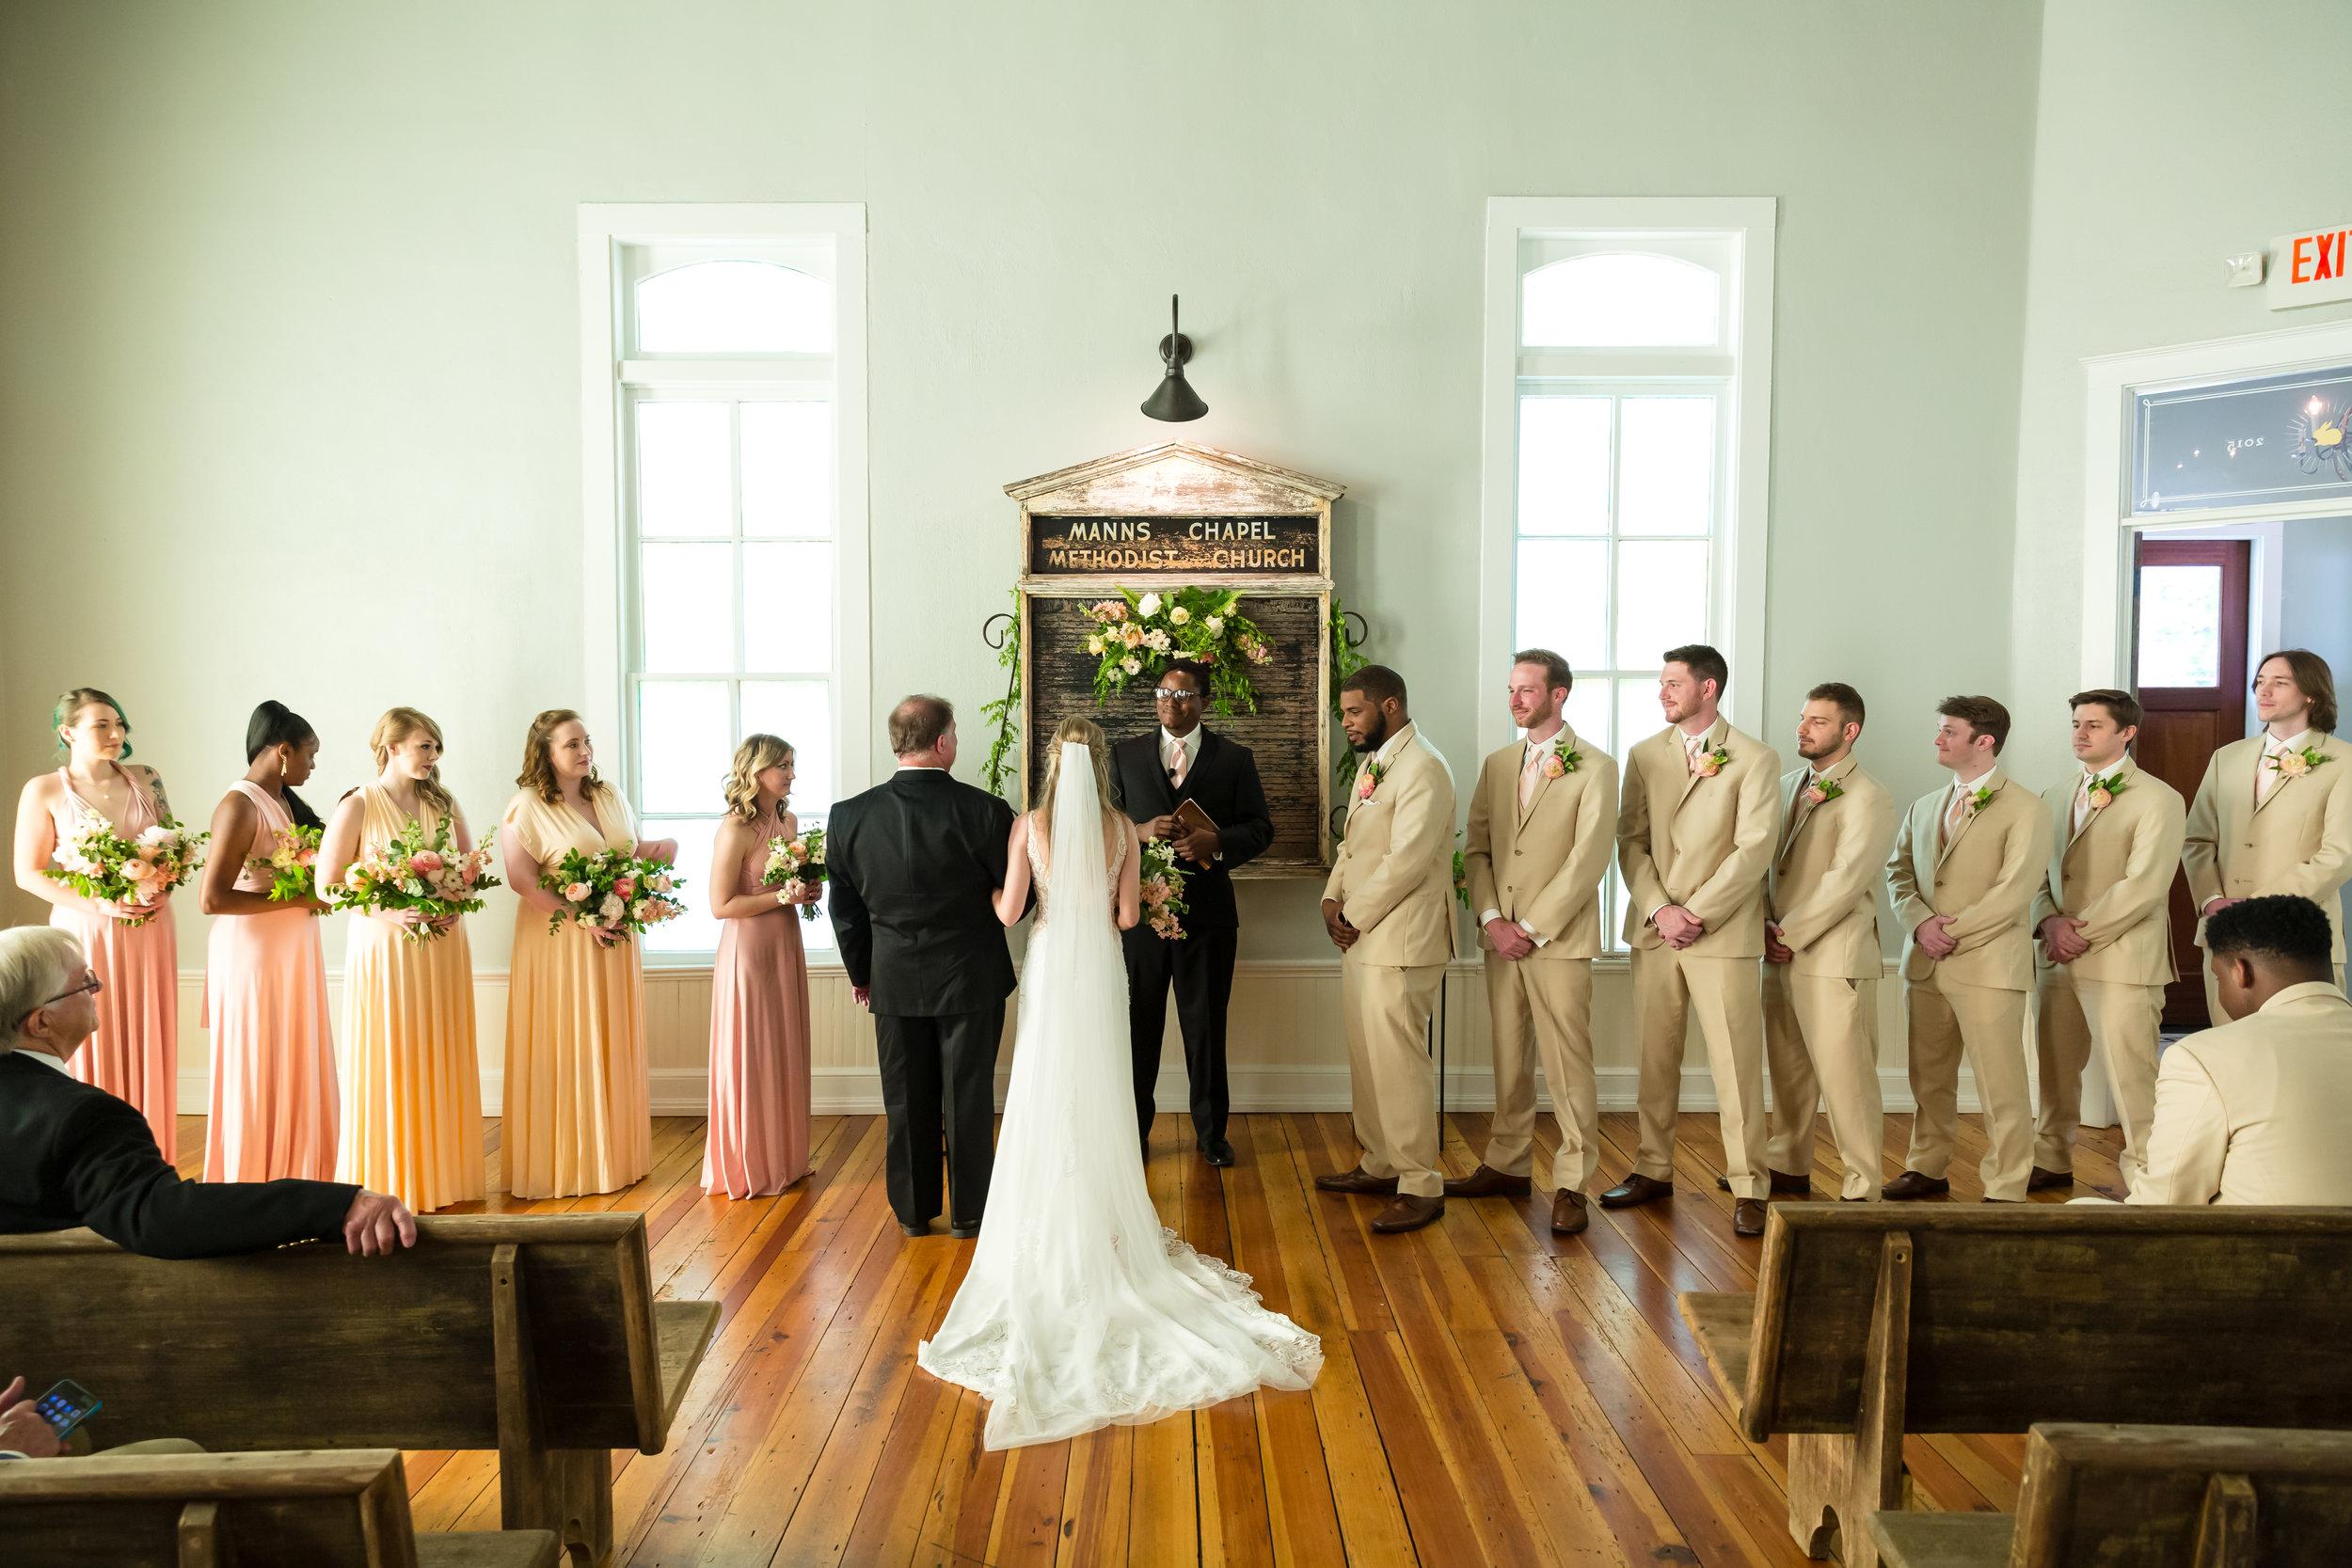 sarah_ikeem_wedding_at_the_parlour_at_manns_chapel_05.18.19-0879.jpg